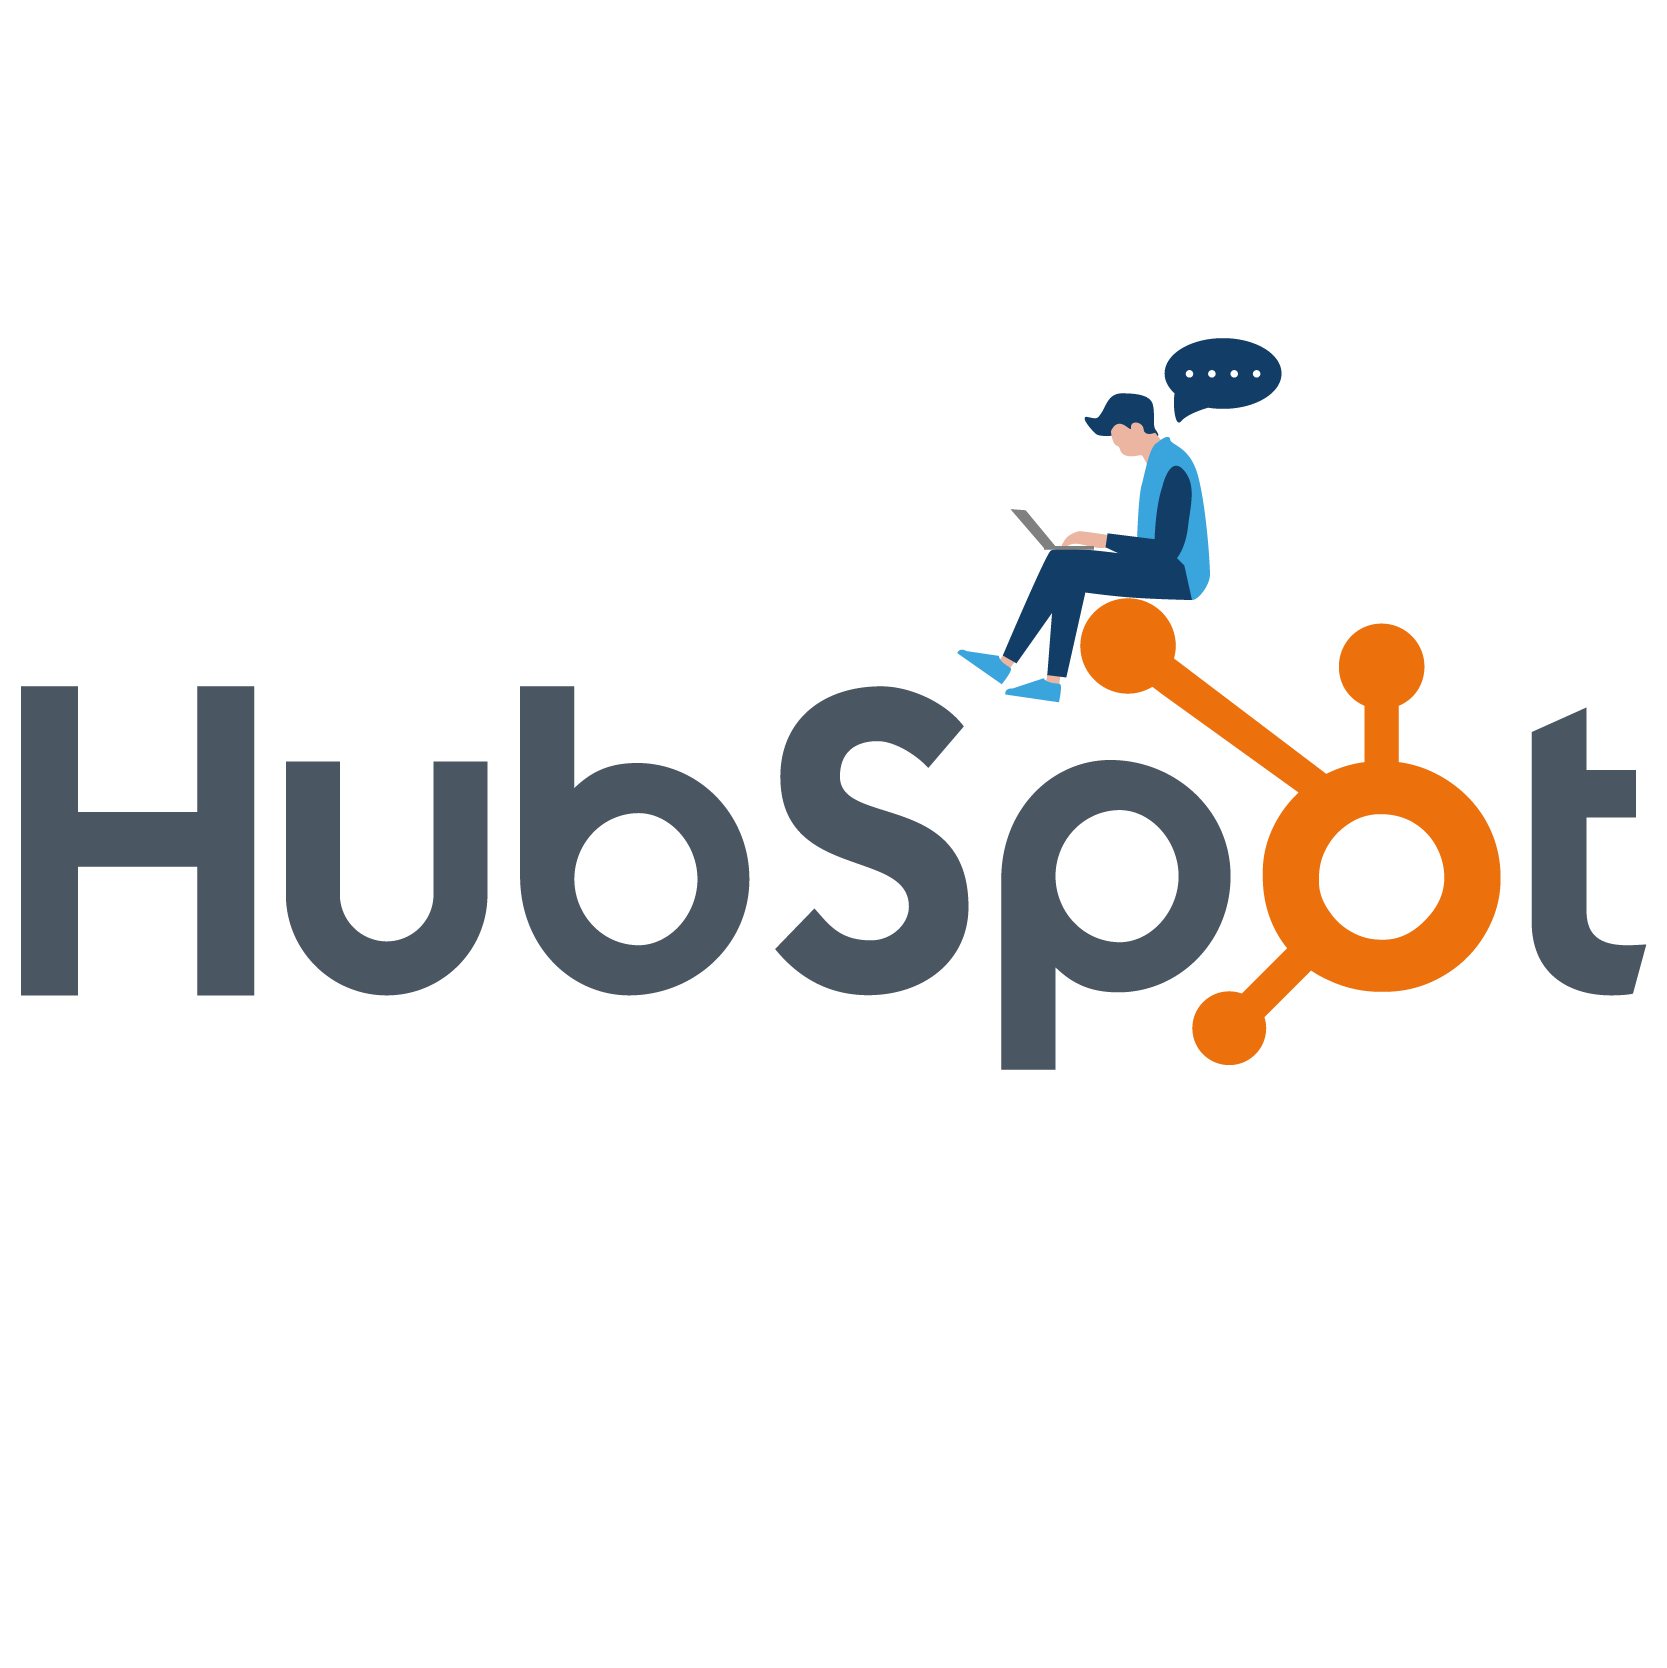 07_Hubspot_Icon-01-01